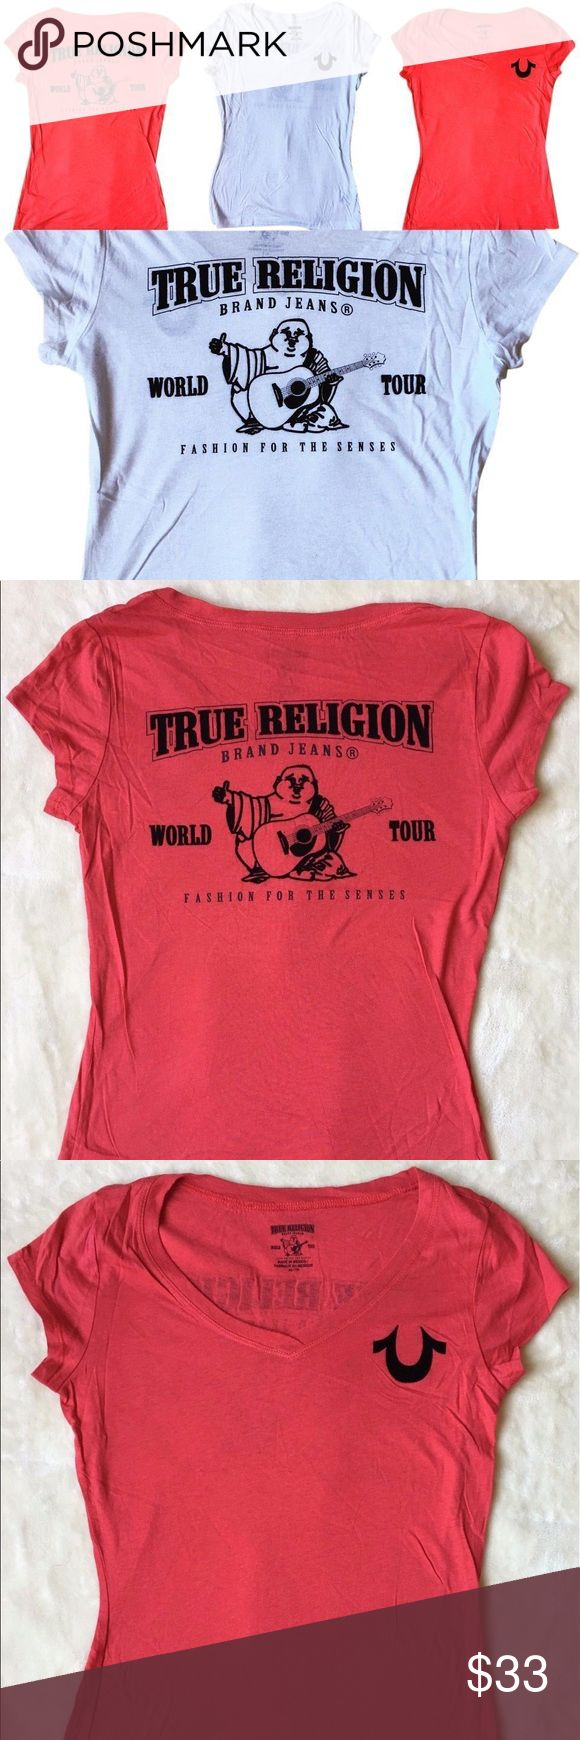 T shirt design 2 zeixs - T Shirt Design 2 Zeixs Women S True Religion Flocked V Neck Tee Shirt Stretch Download